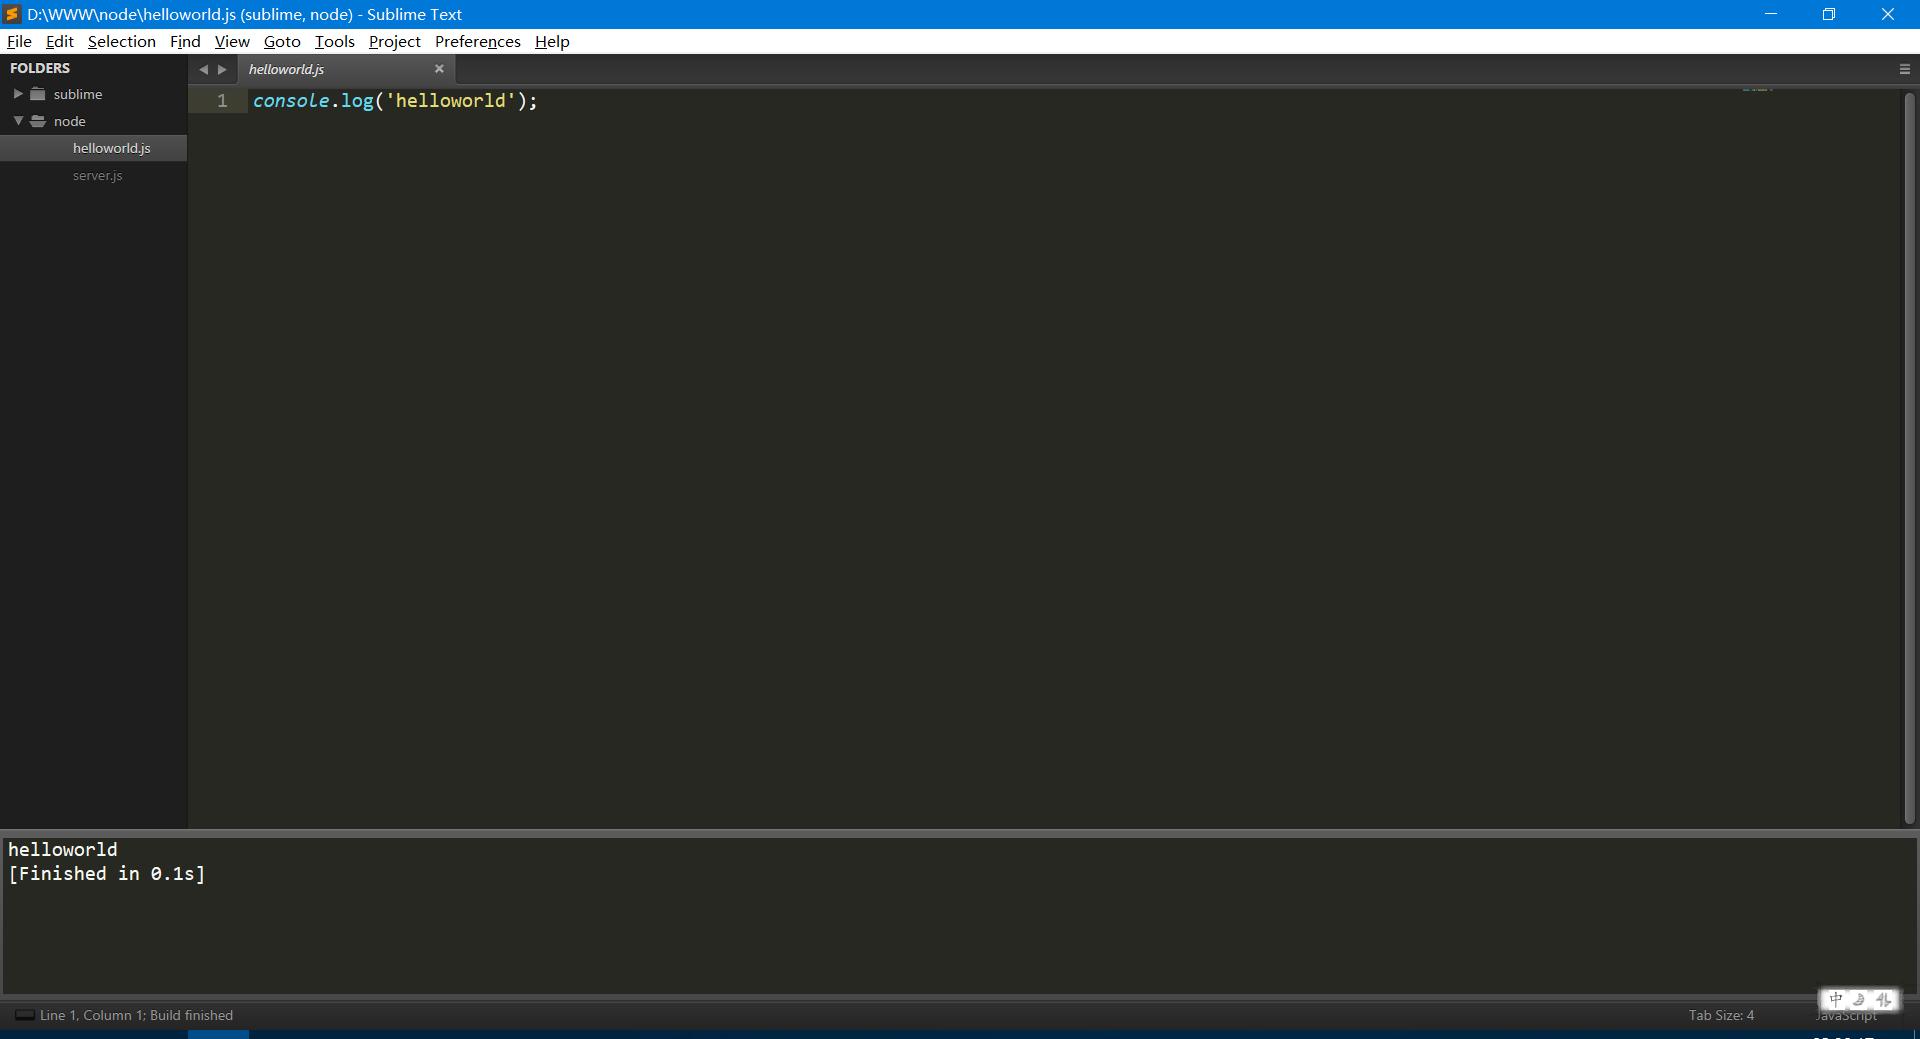 Sublime Text 3 Build System